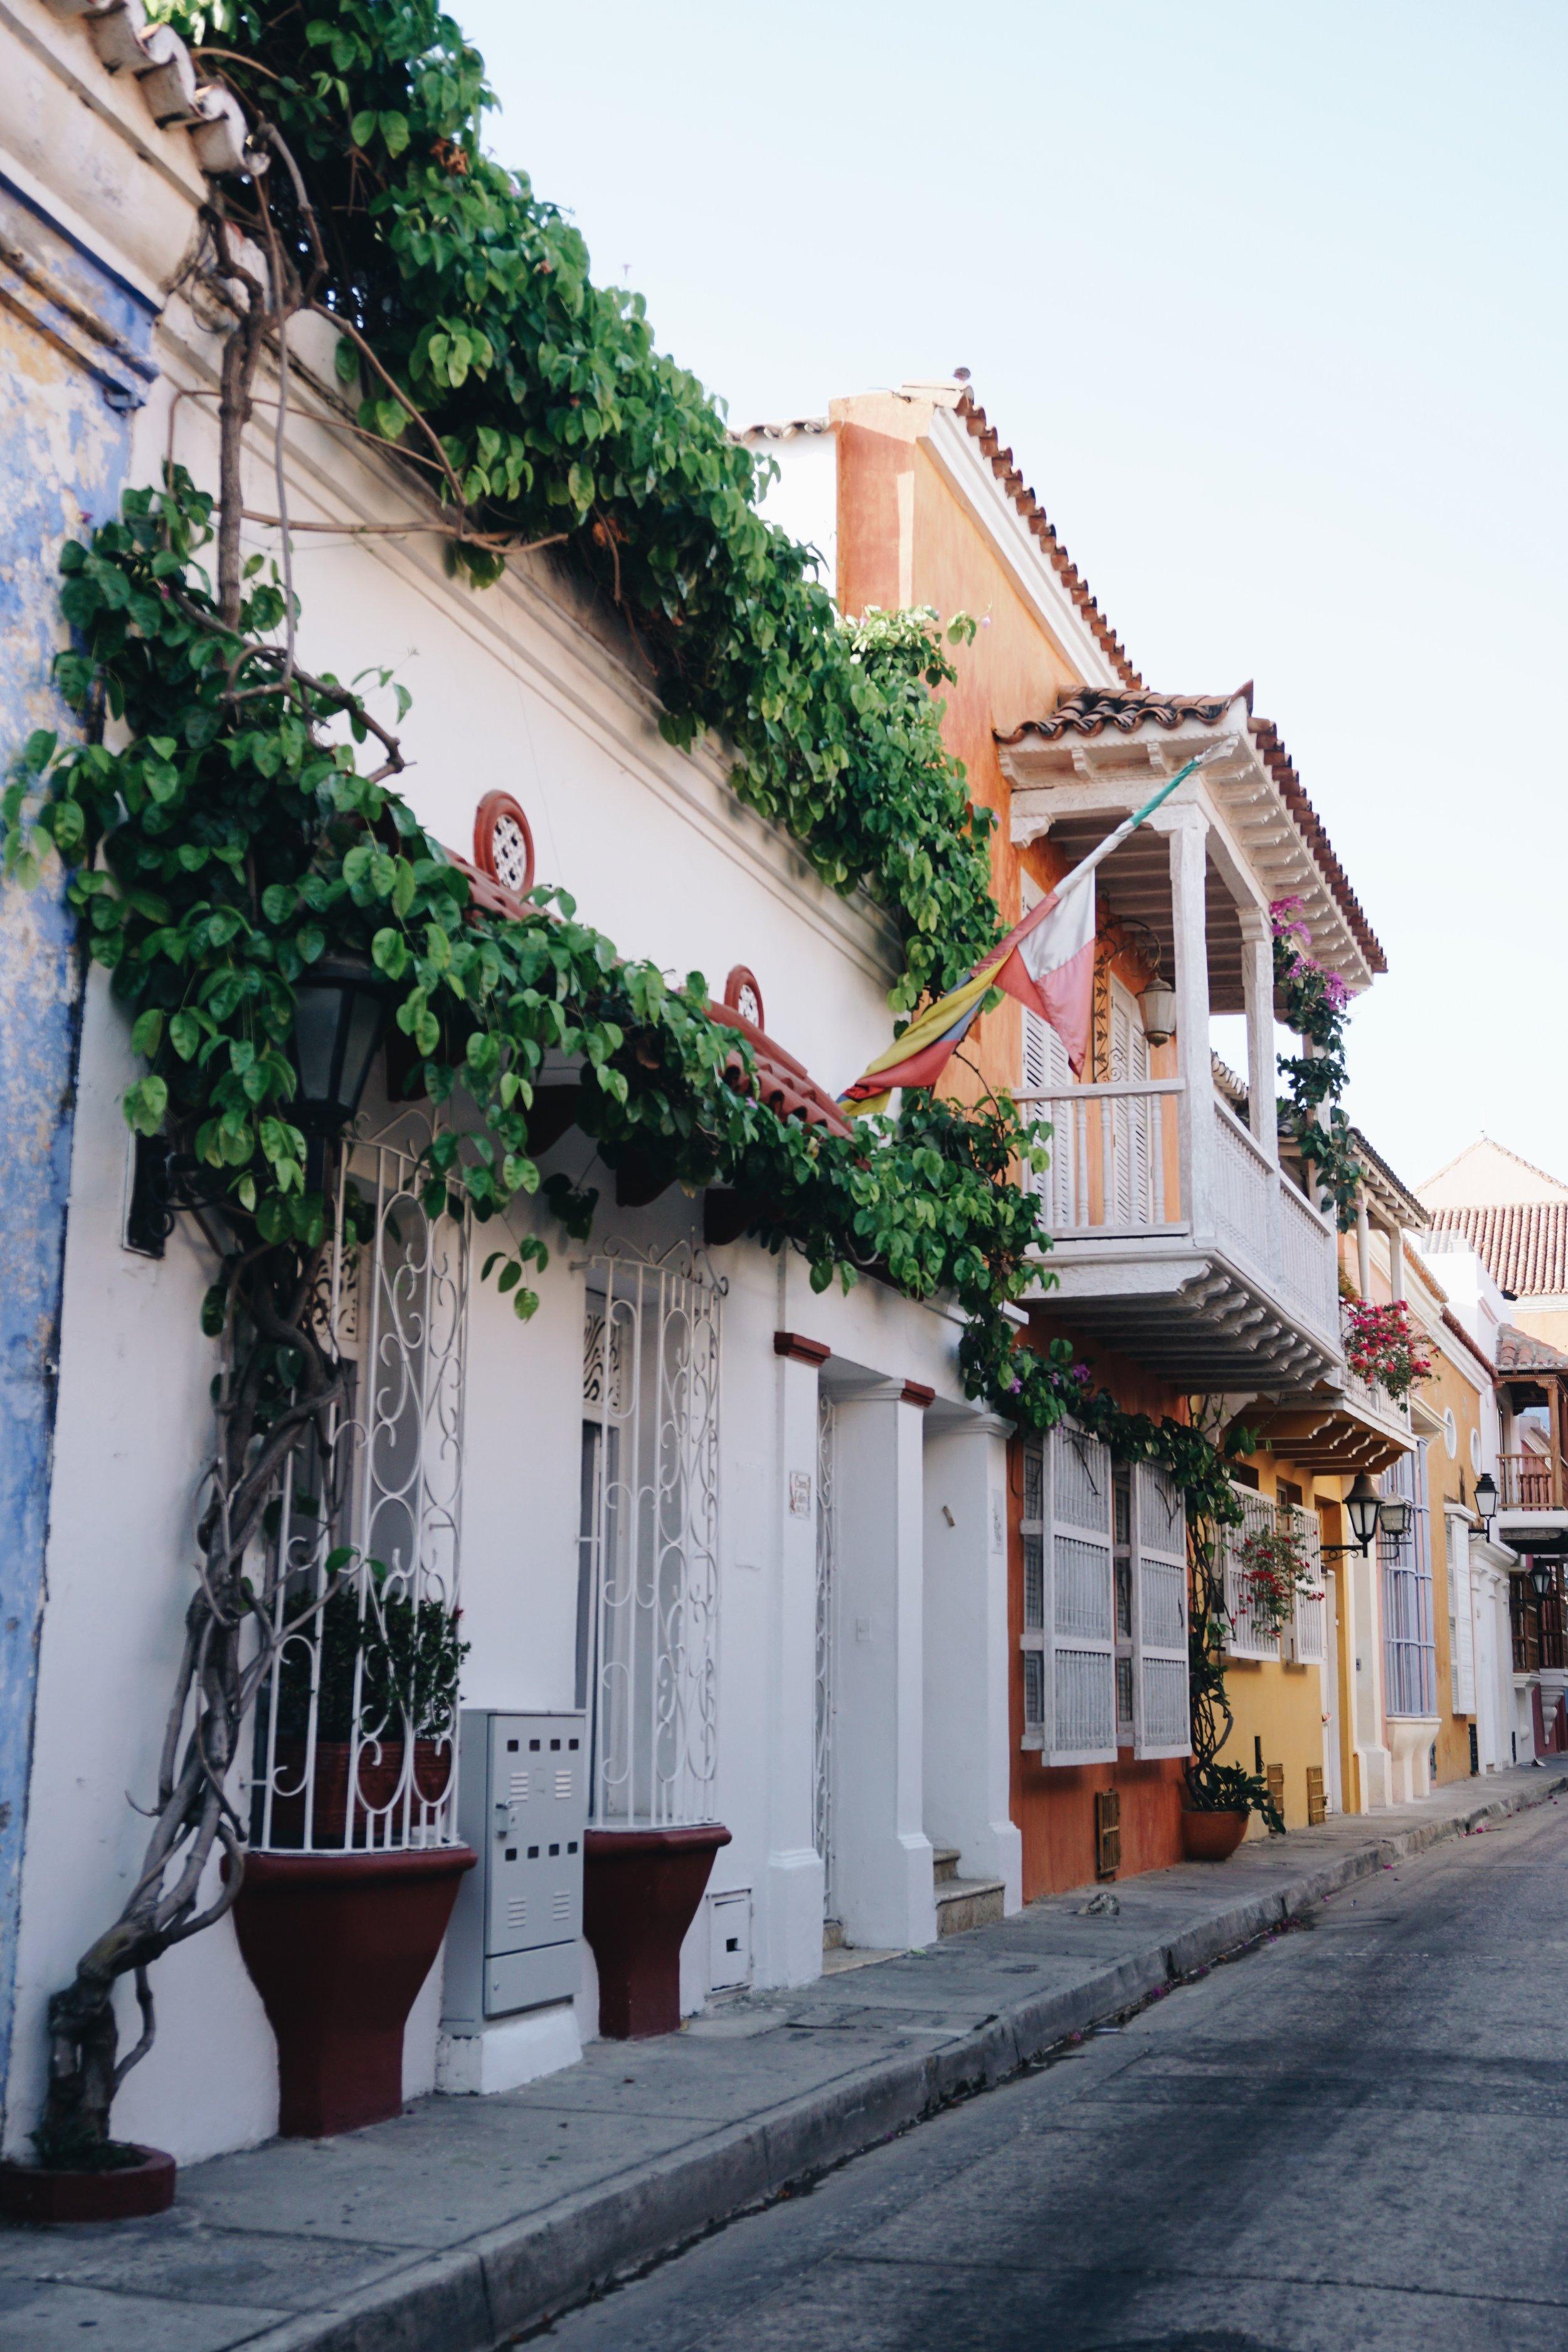 Julia Friedman's travel diary to Cartagena, Colombia.